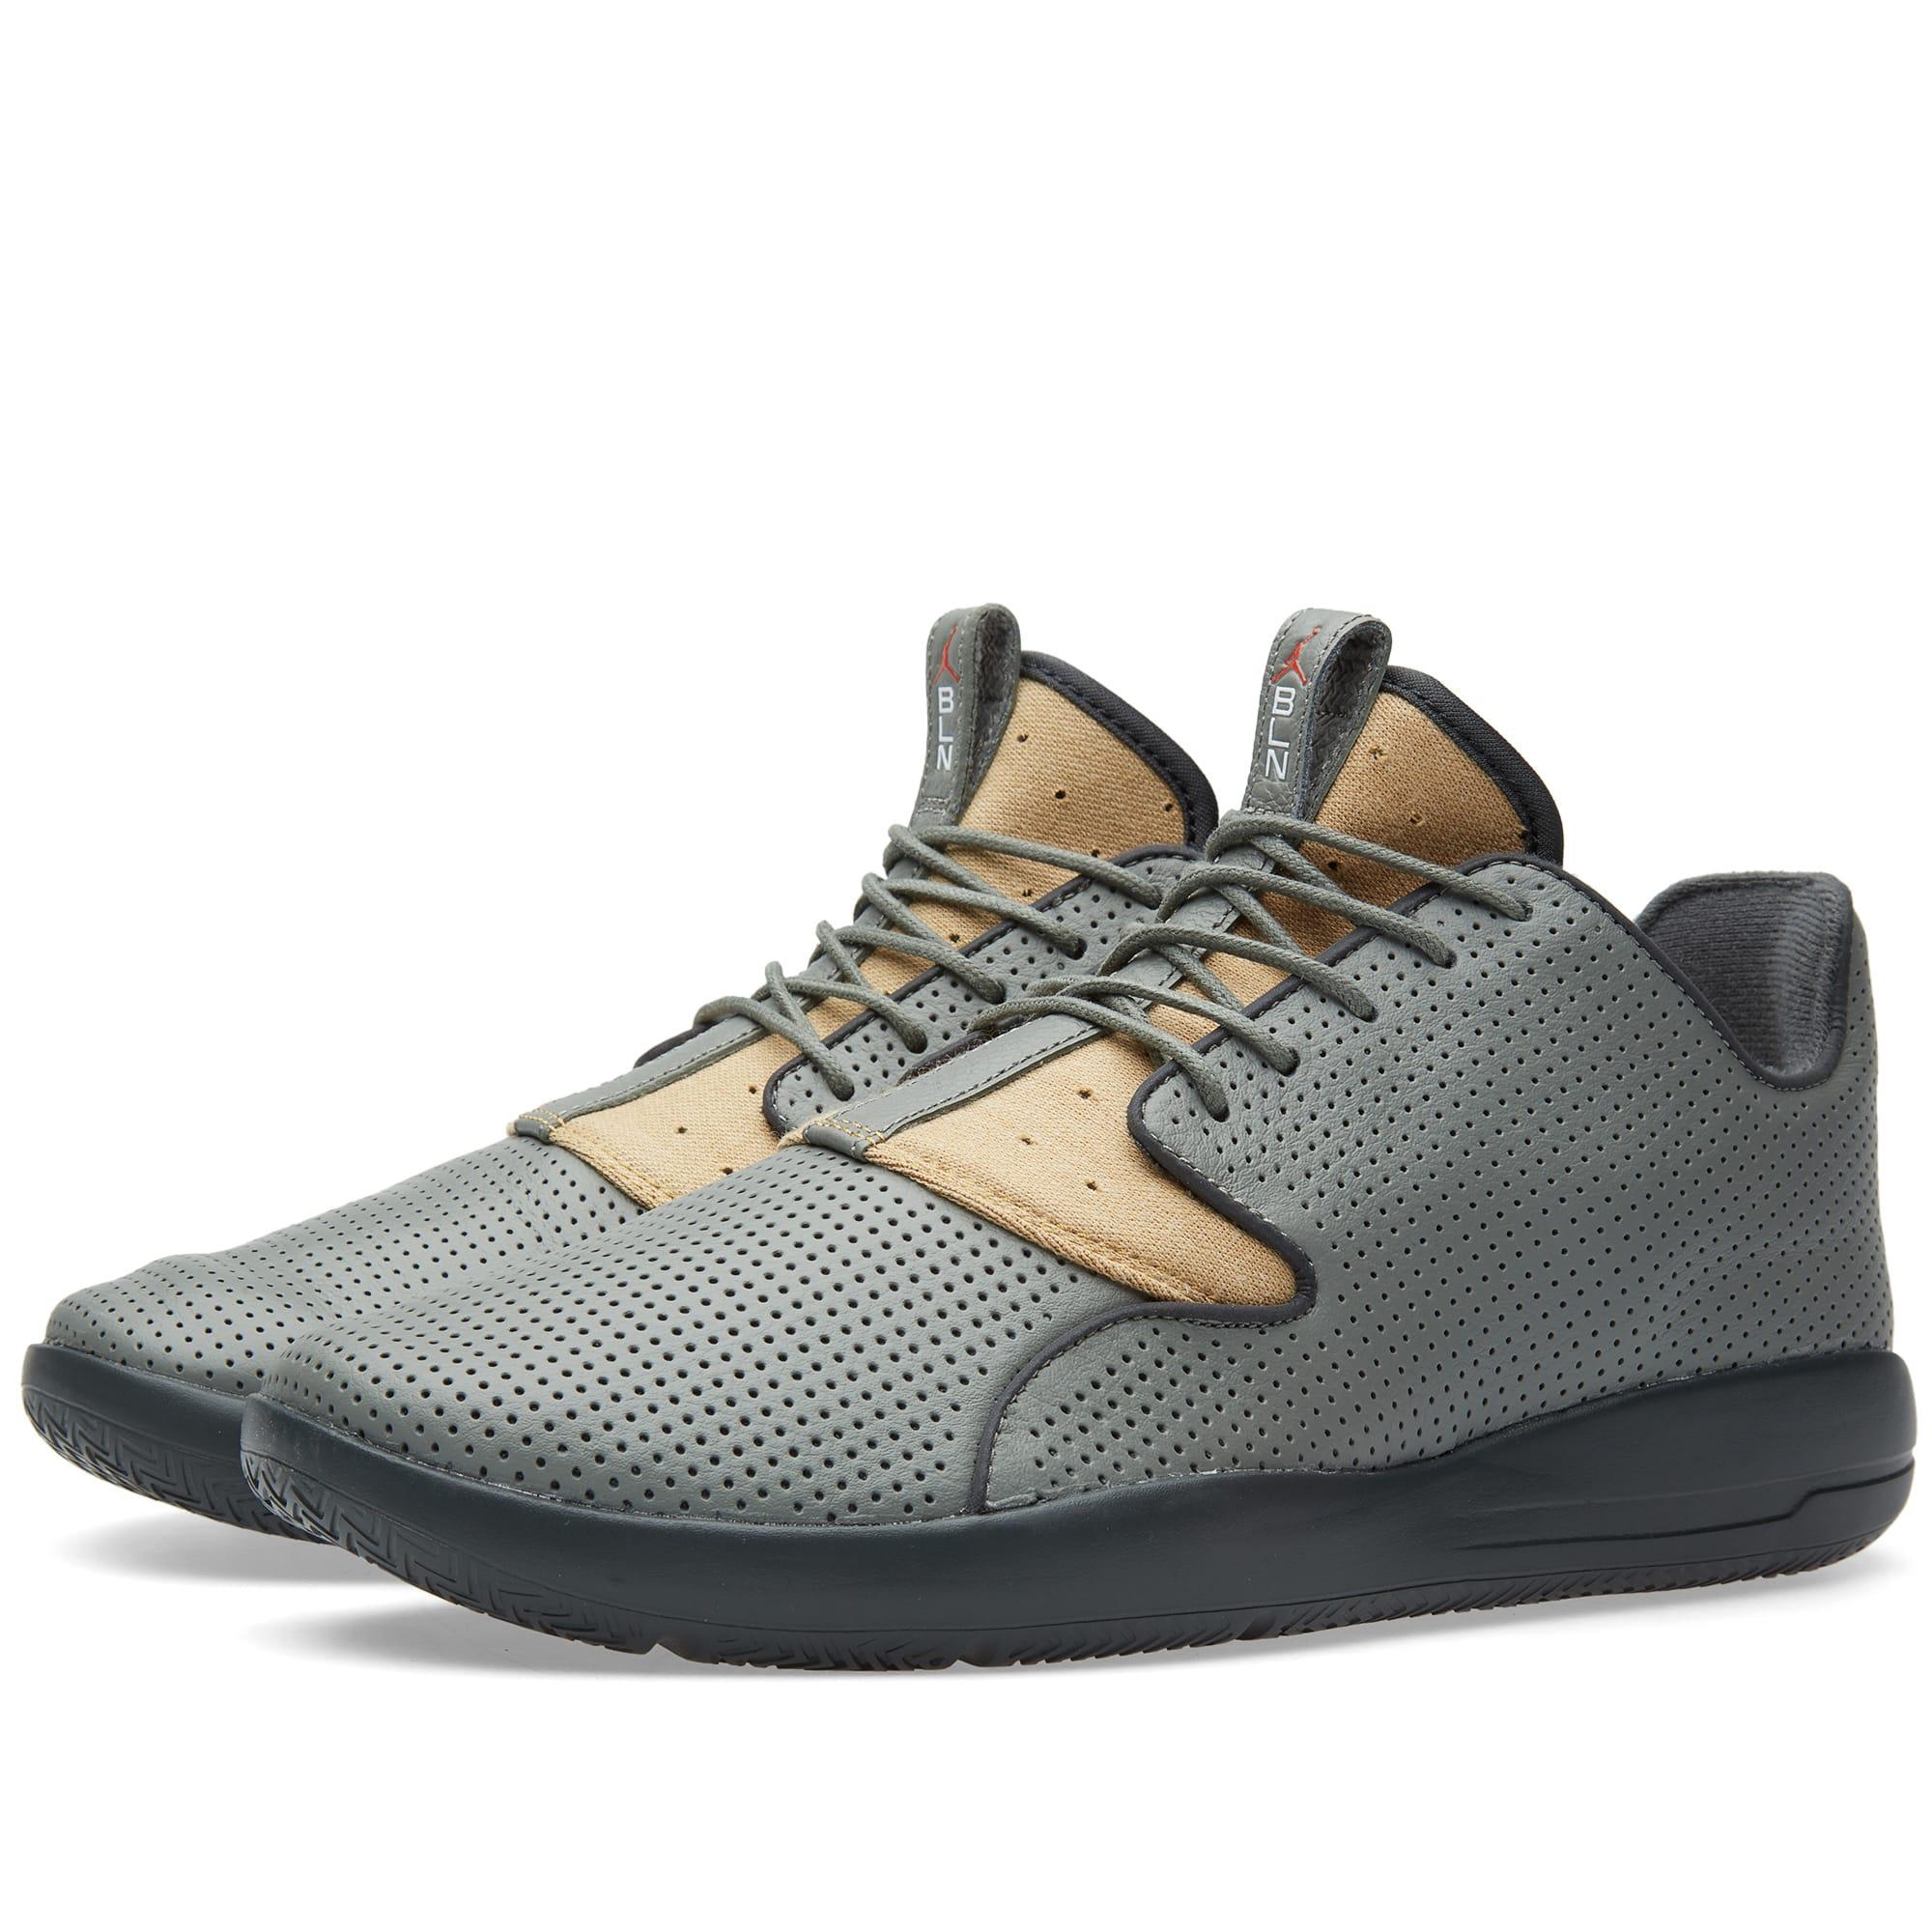 cheap for discount 26acd 78bdb Nike Jordan Eclipse Leather  Berlin  Tumbled Grey   Cinnabar   END.